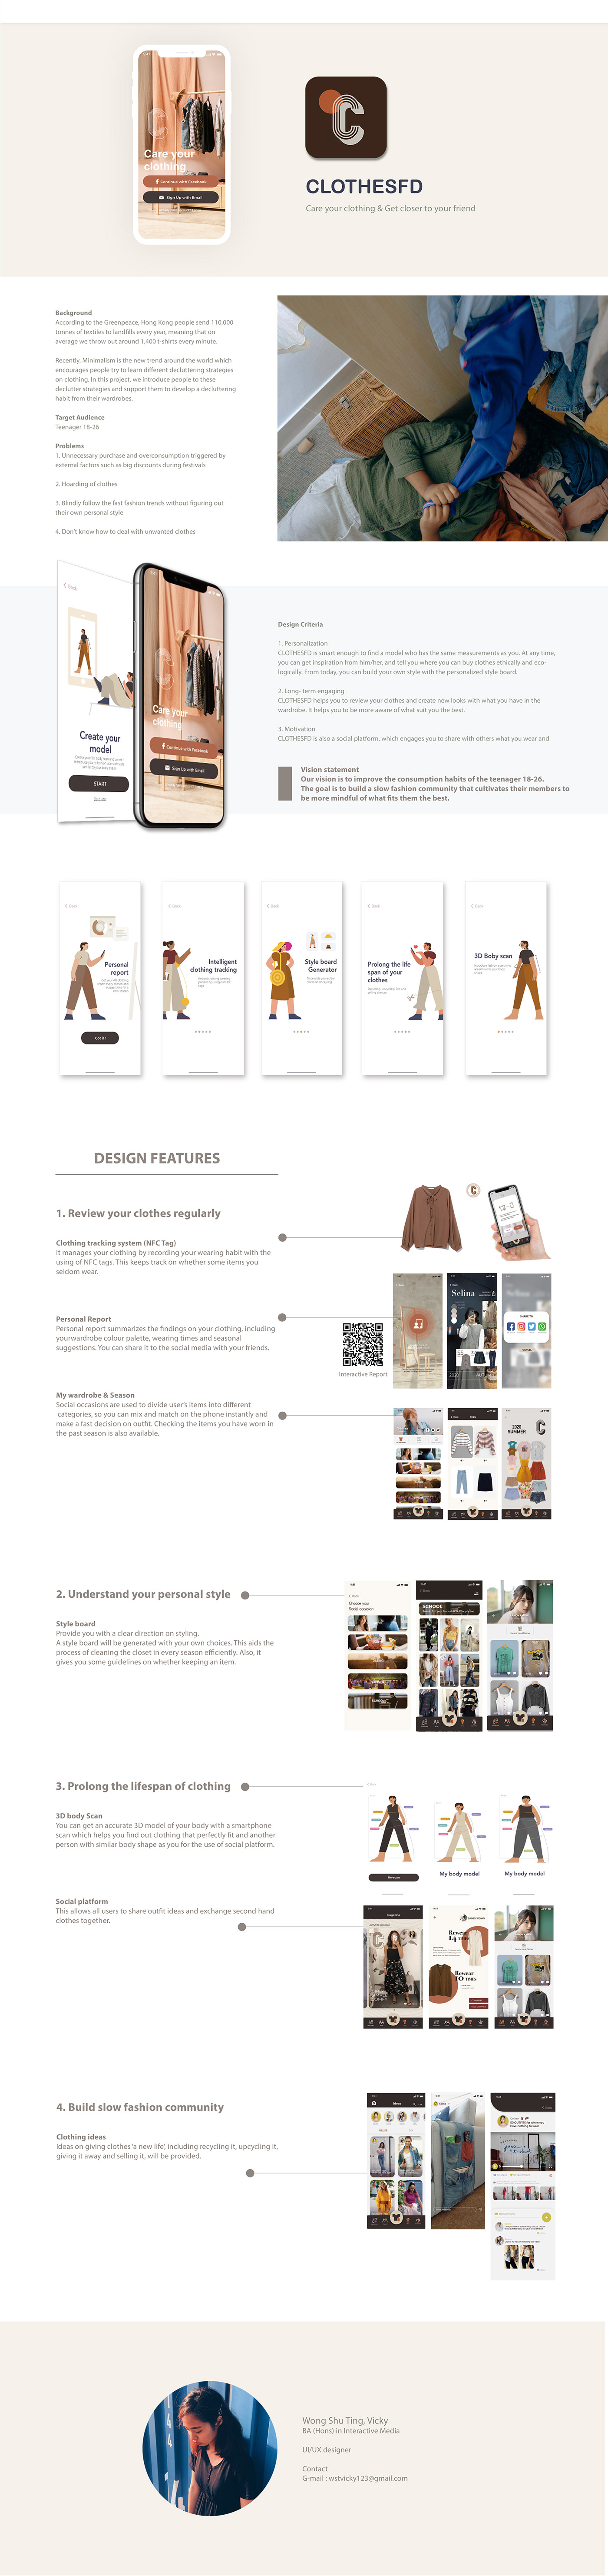 app clothes design Interaction design  Minimalism slowfashion UI ux